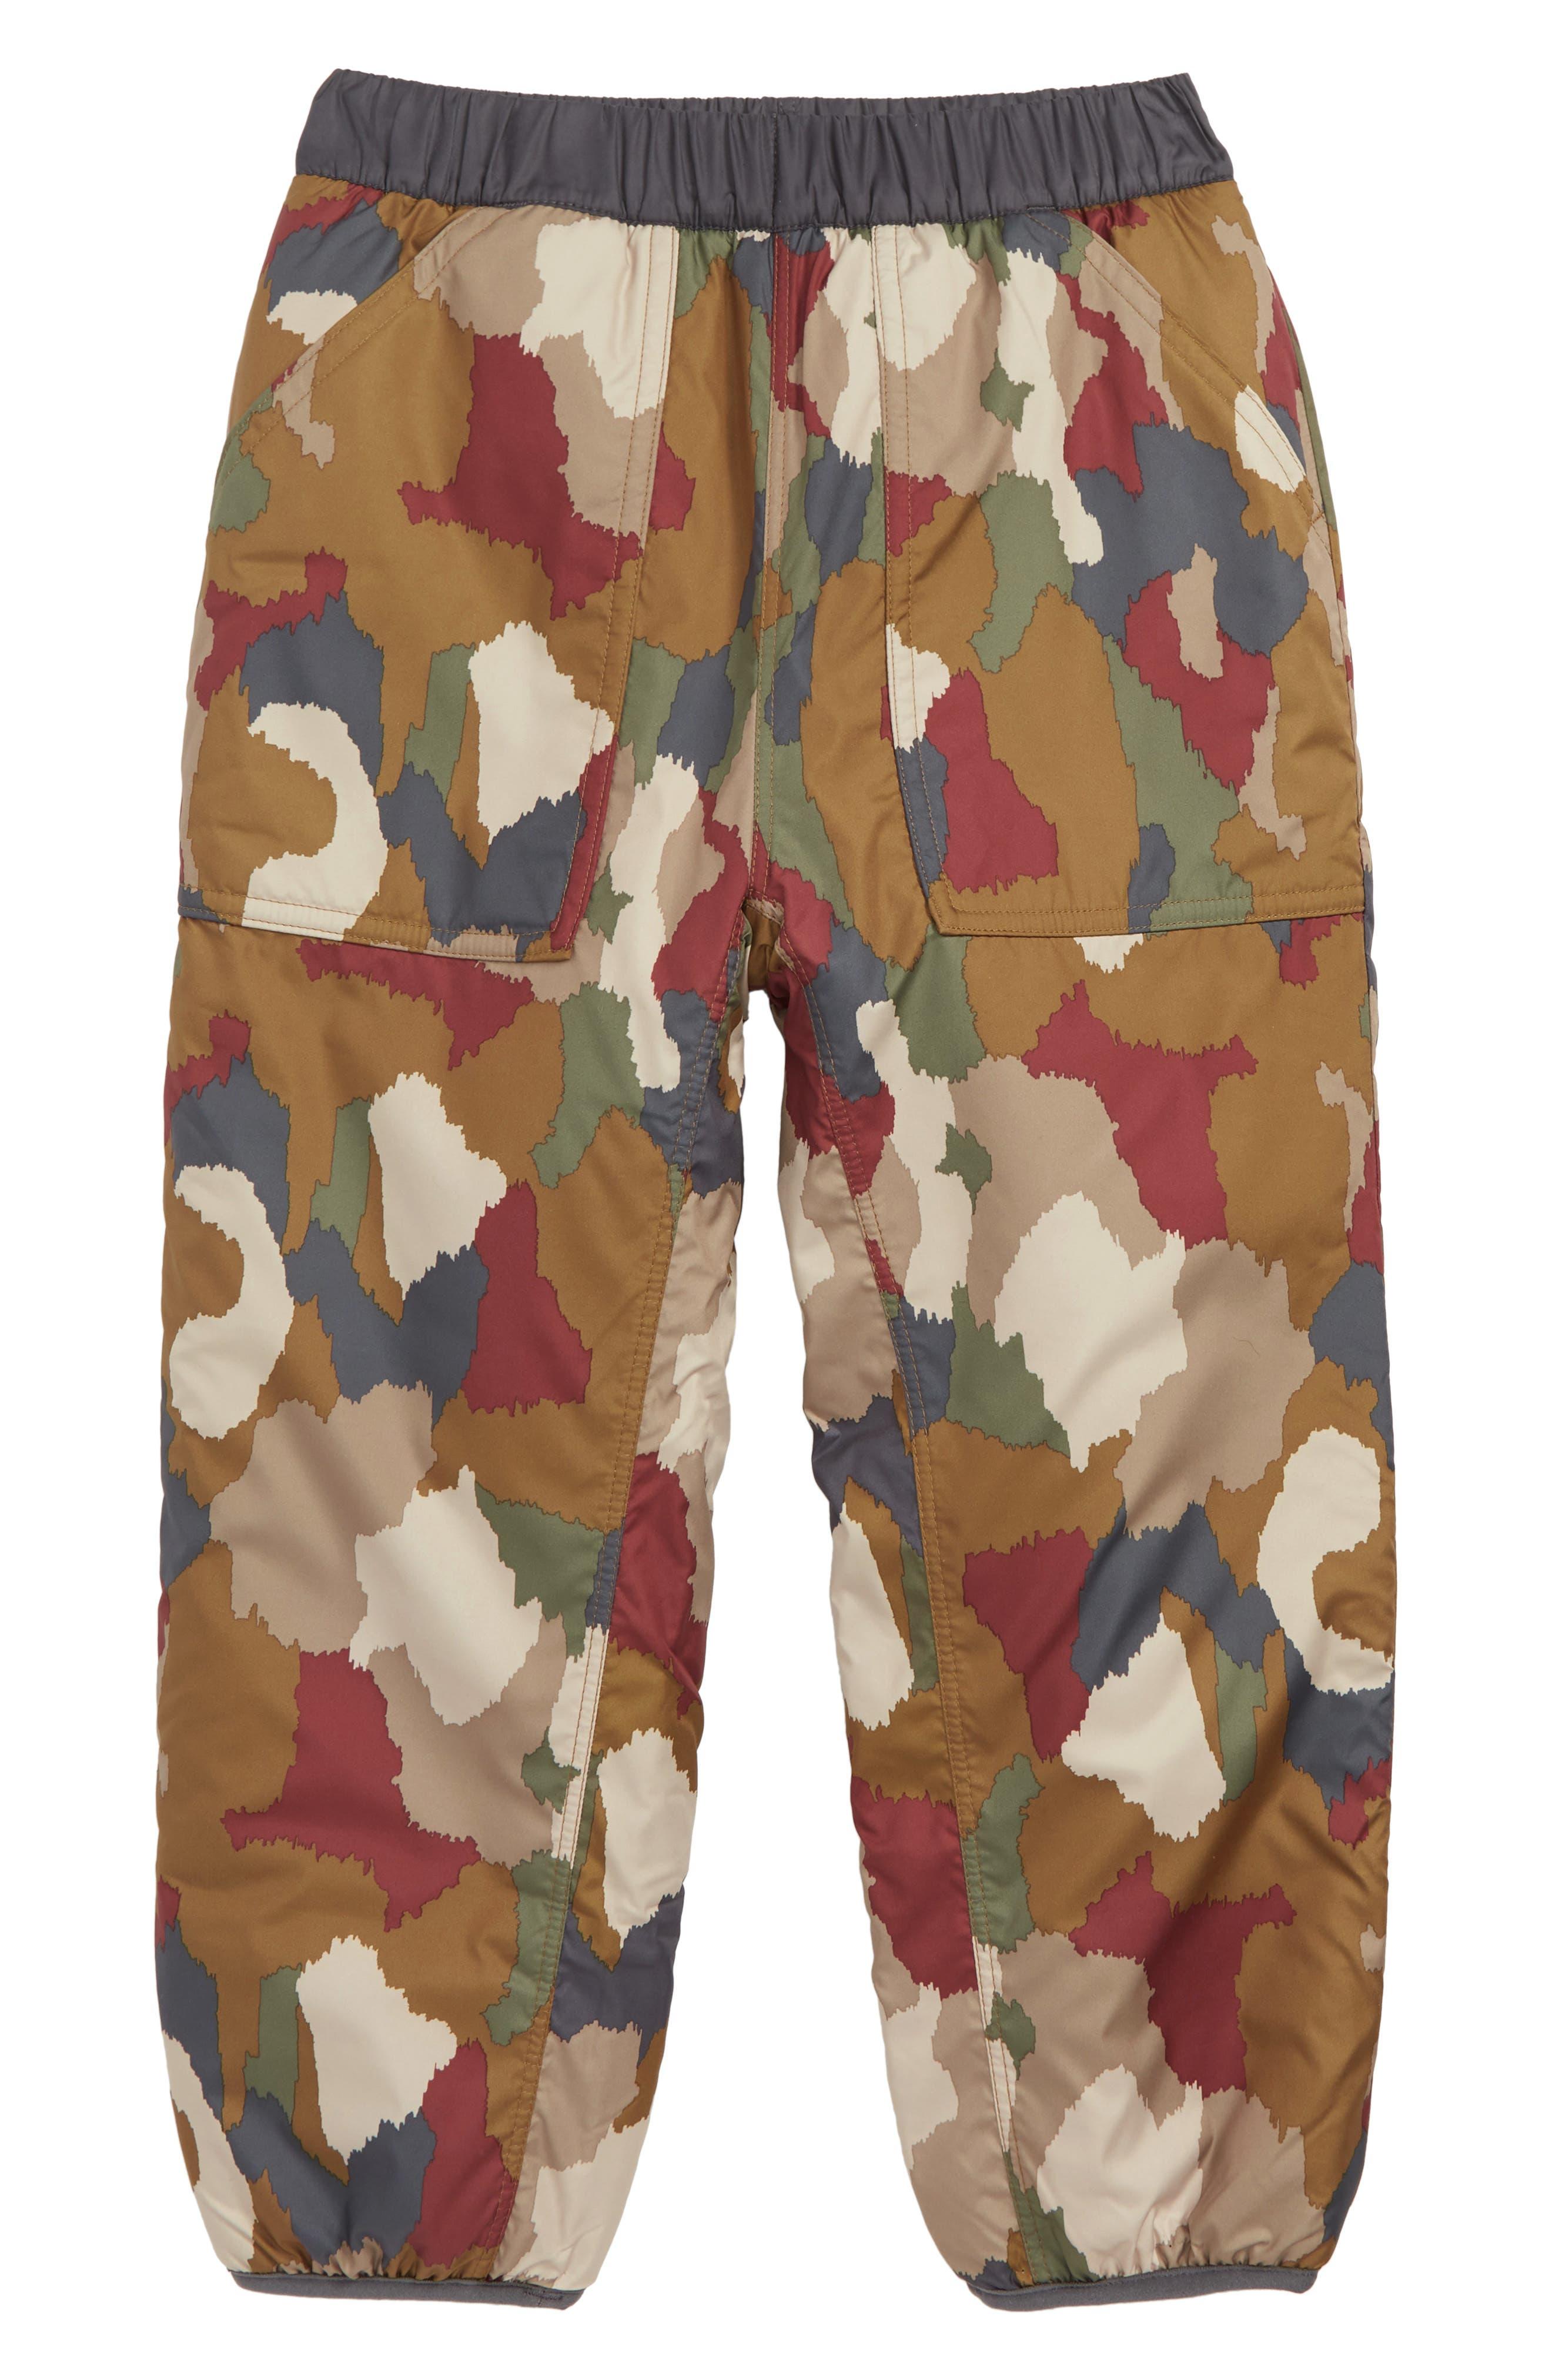 Tribbles Reversible Water Repellent Snow Pants,                         Main,                         color, BCEL BUNKER CAMO: EL CAP KHAKI